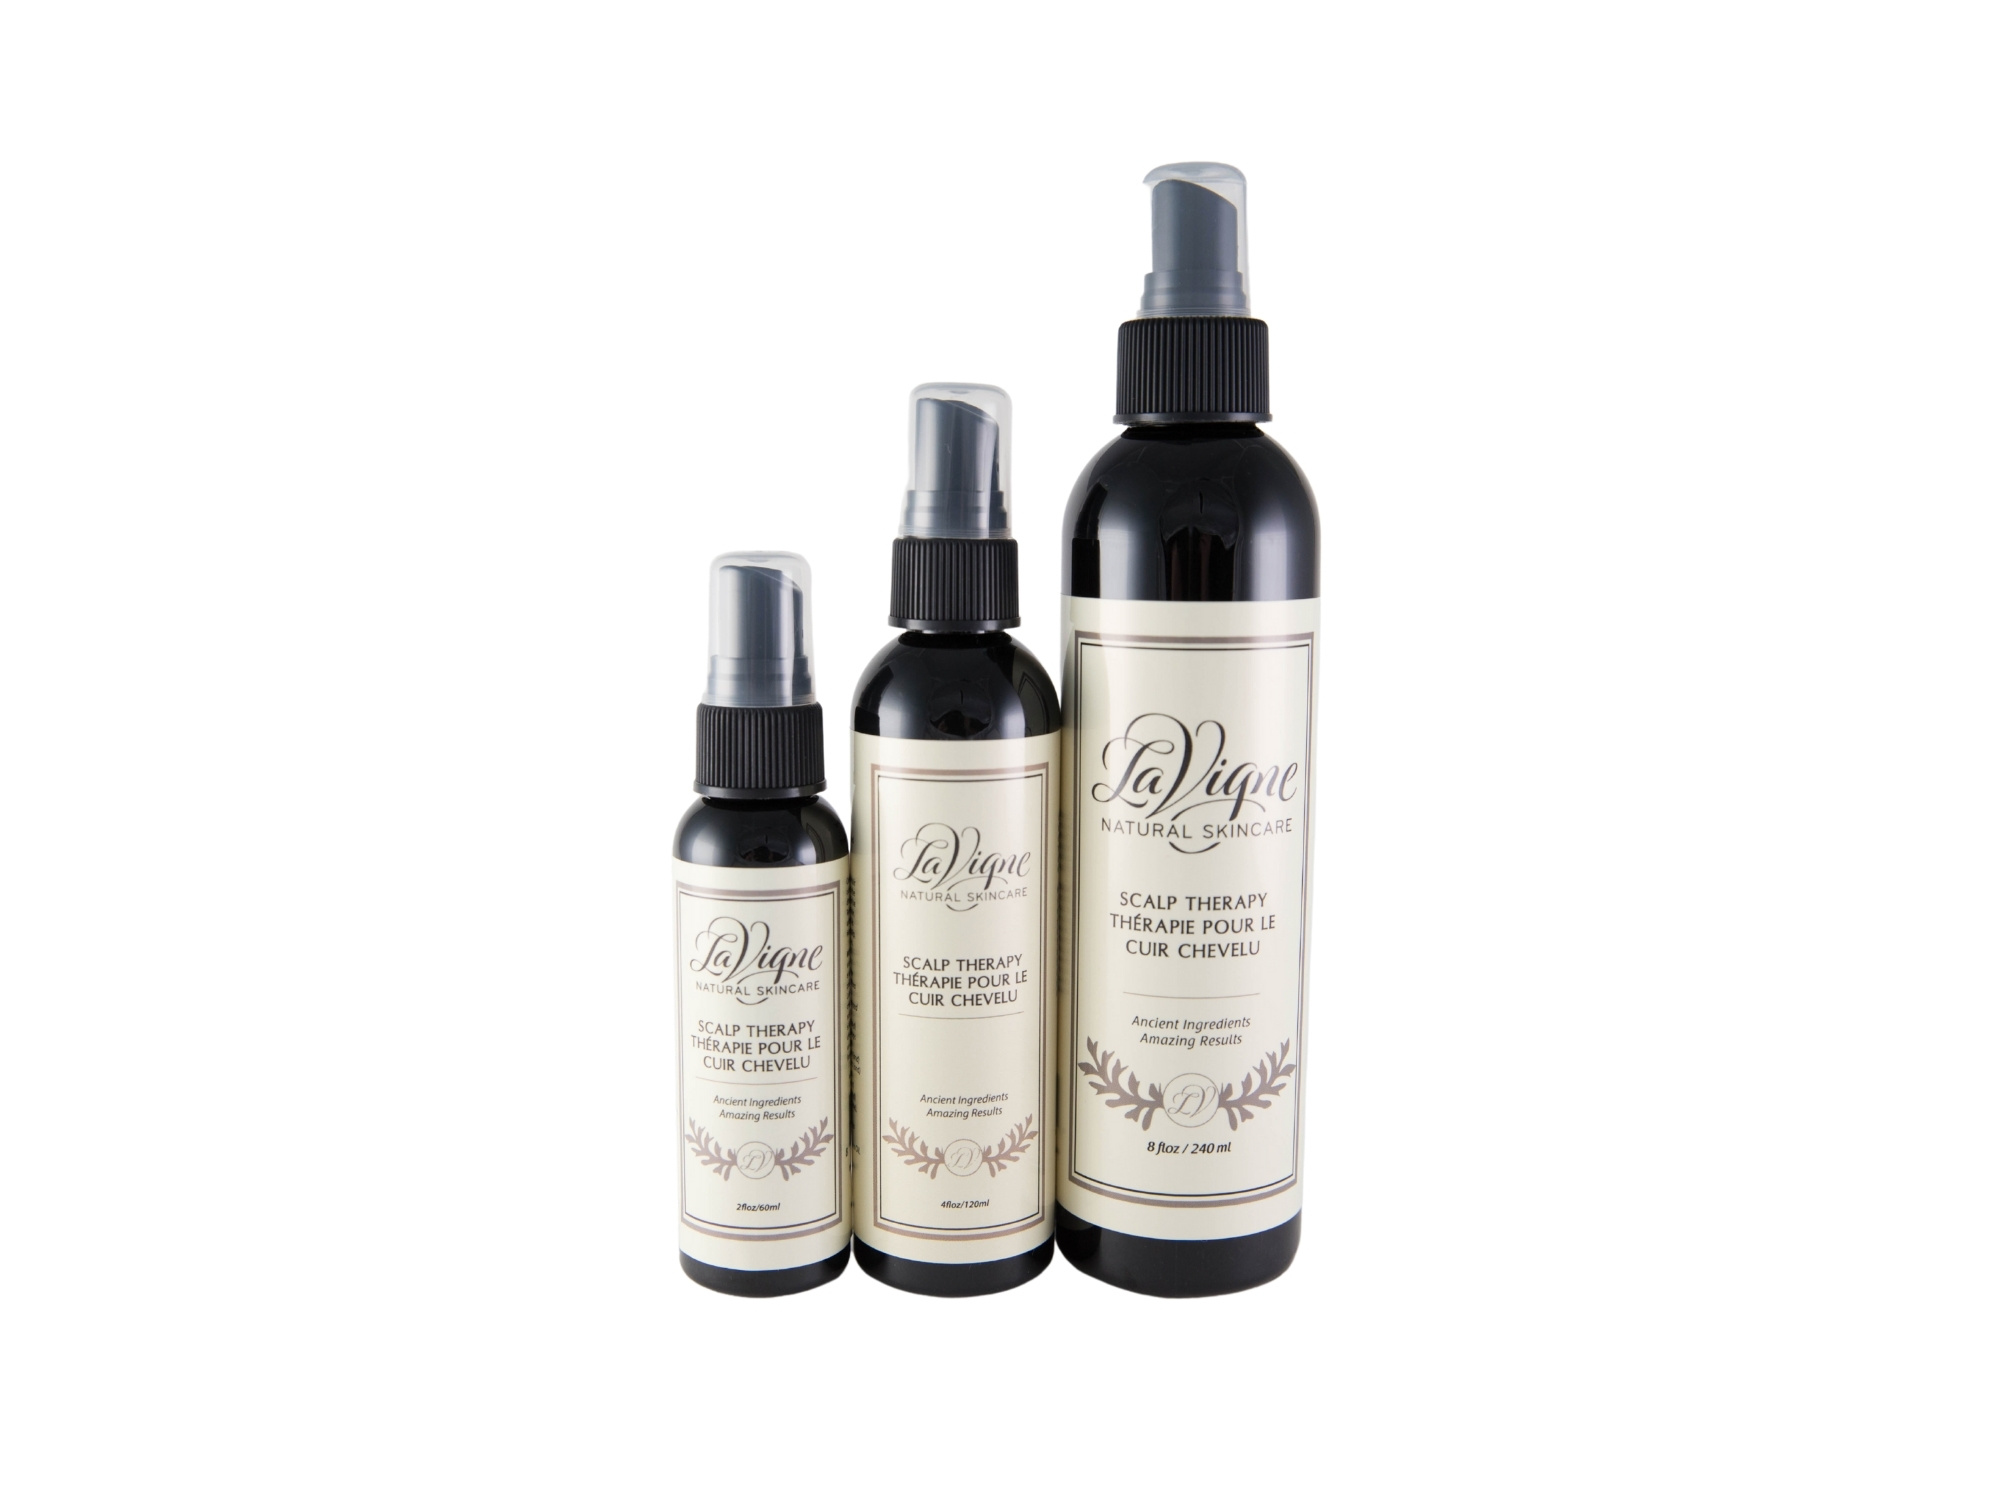 Lavigne Organics Scalp Therapy leave-in treatment - 60 ml